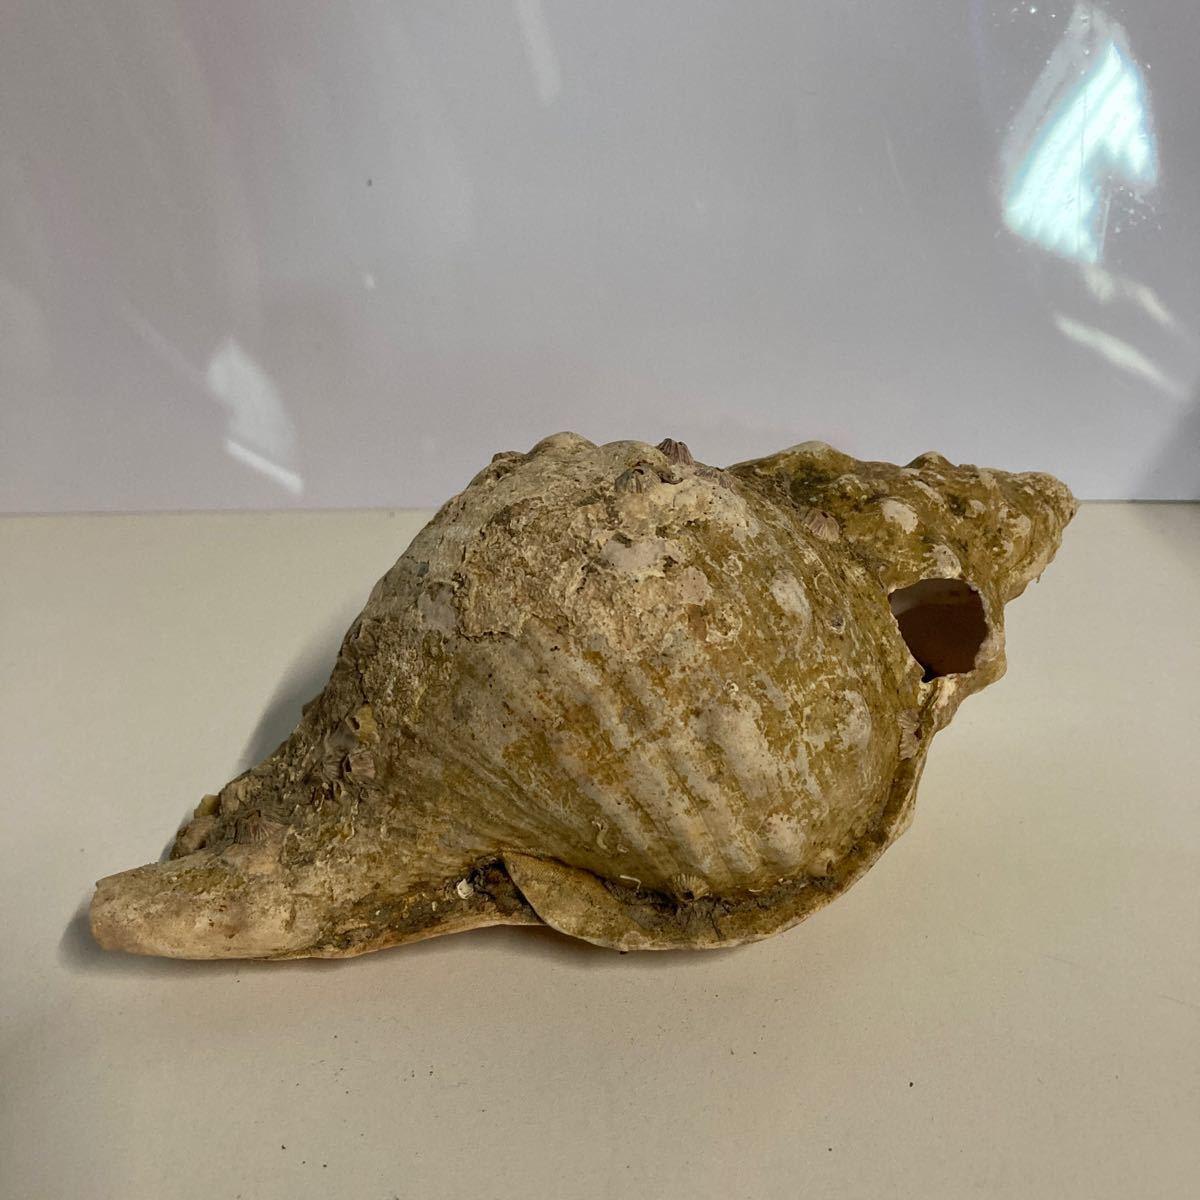 貝殻 貝標本 天然貝殻 貝殻標本 ホラガイ?2_画像1